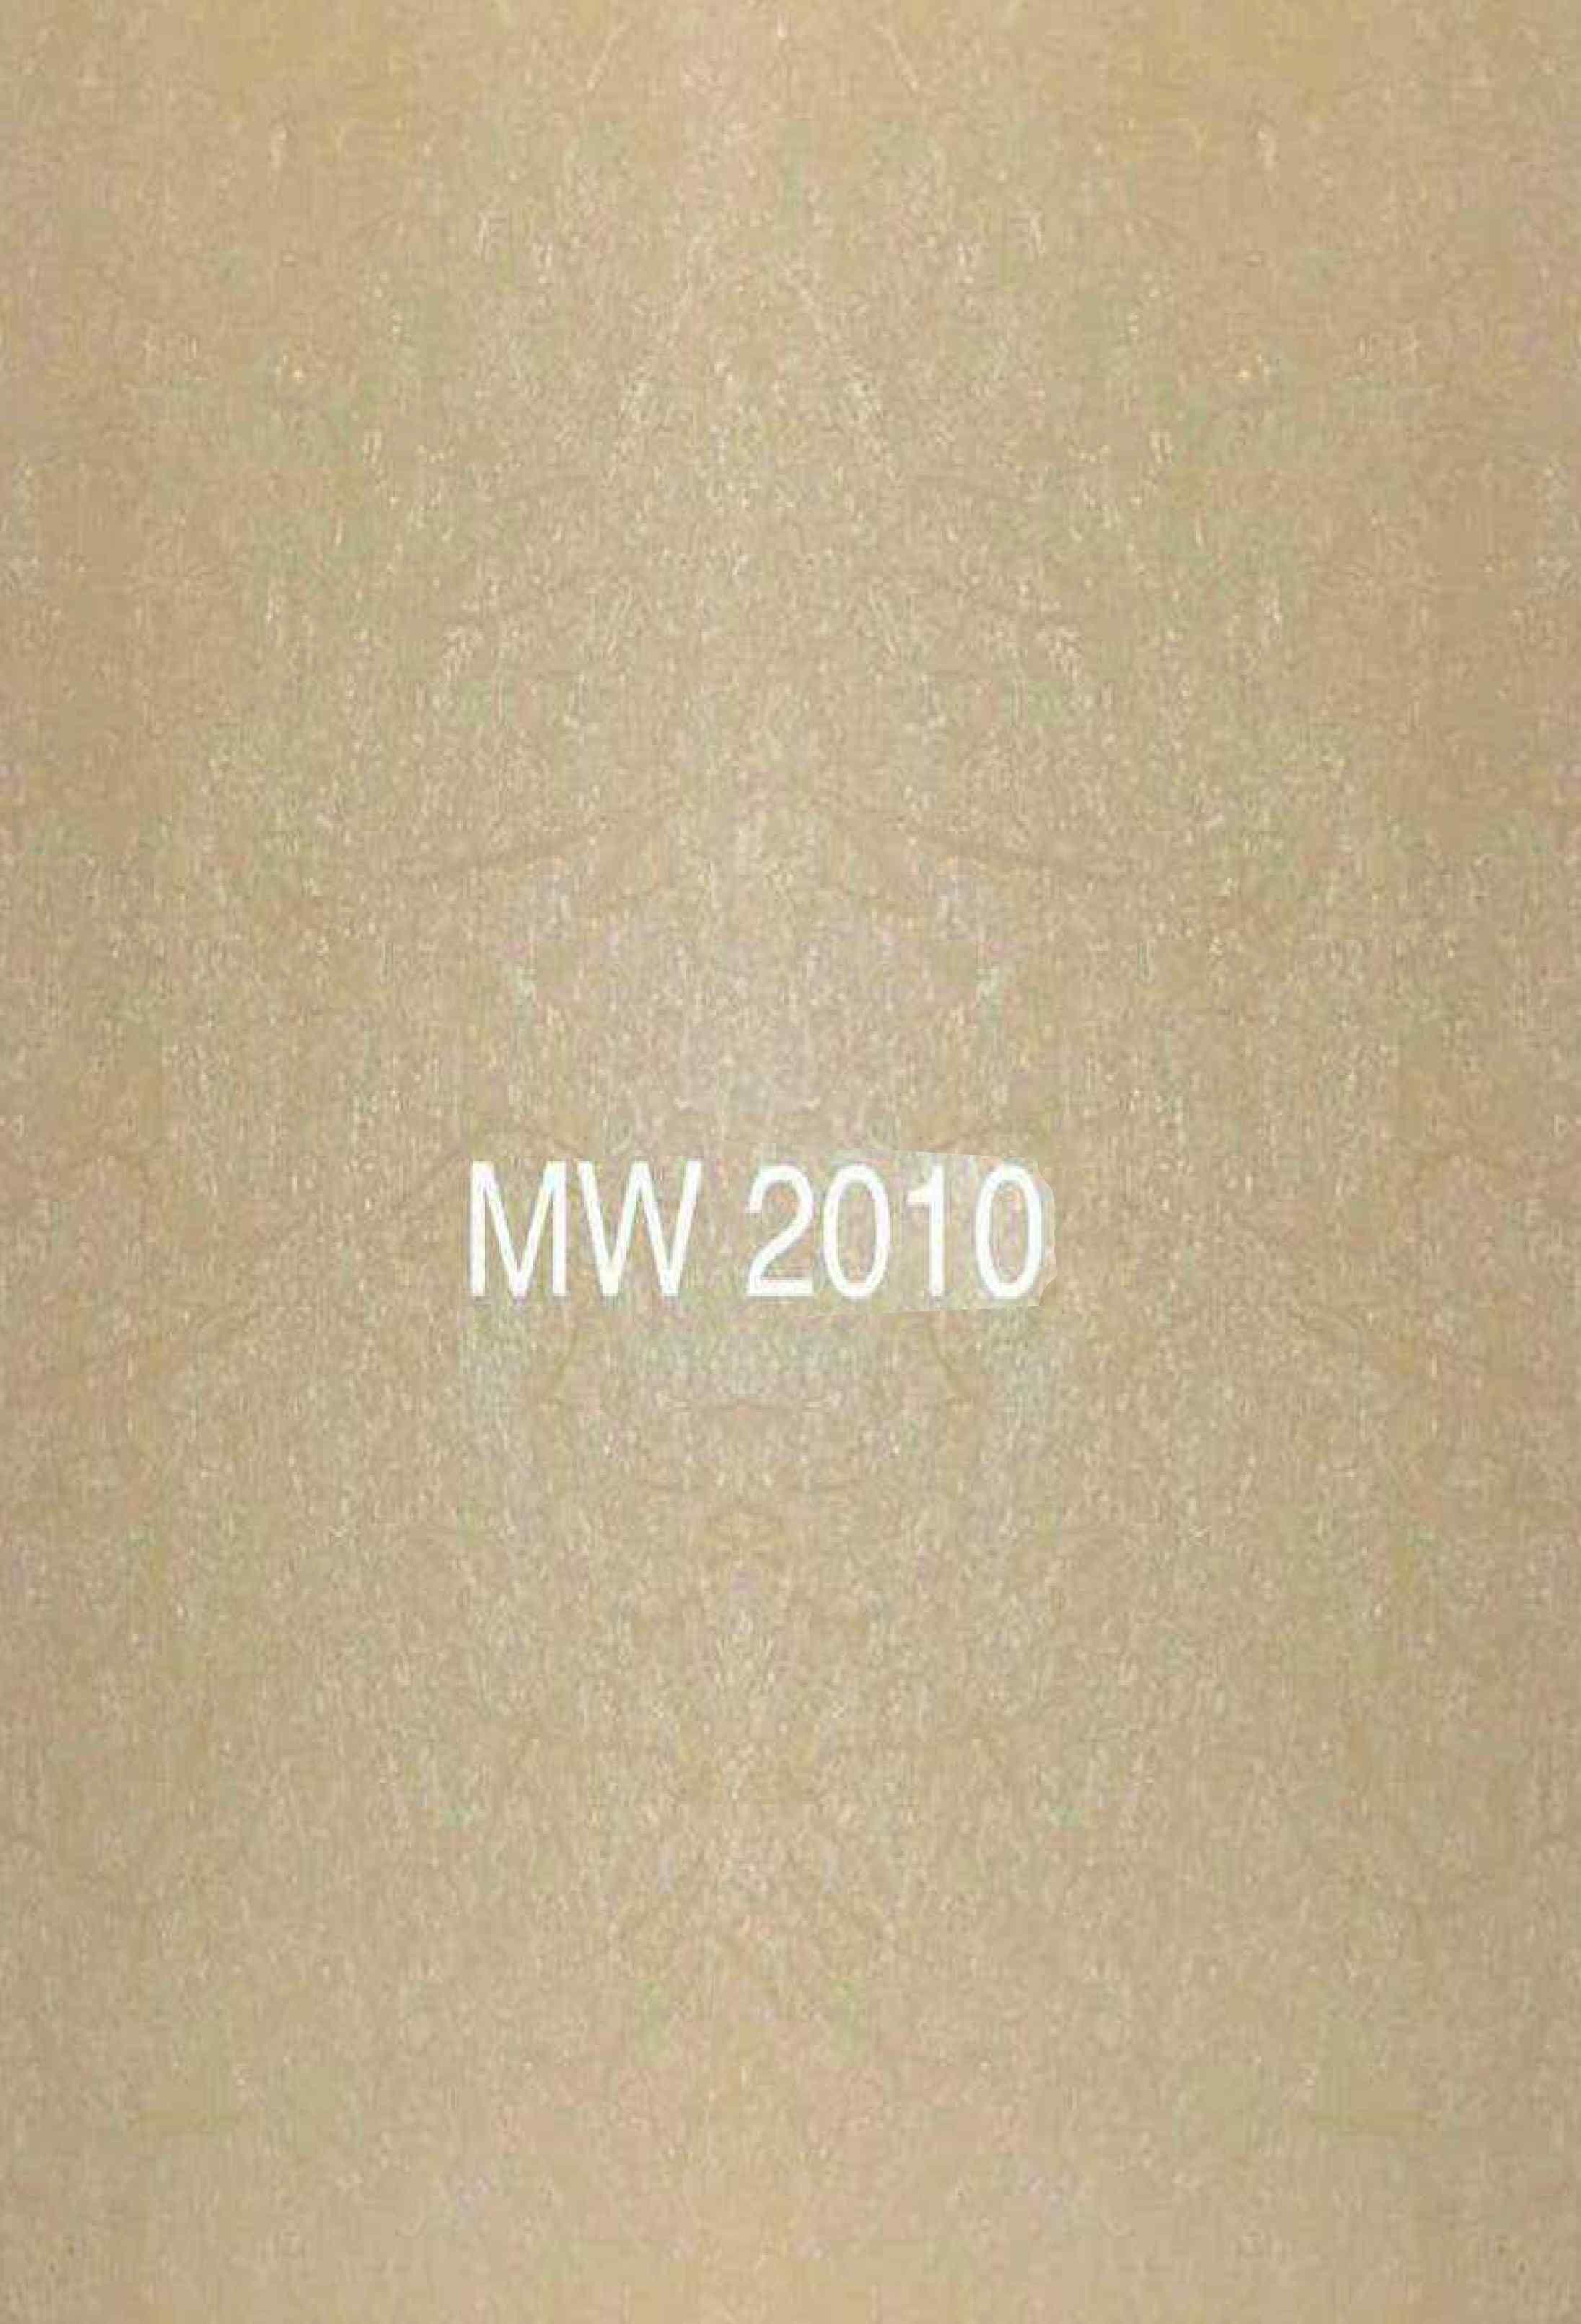 pvc panel - mw-2010